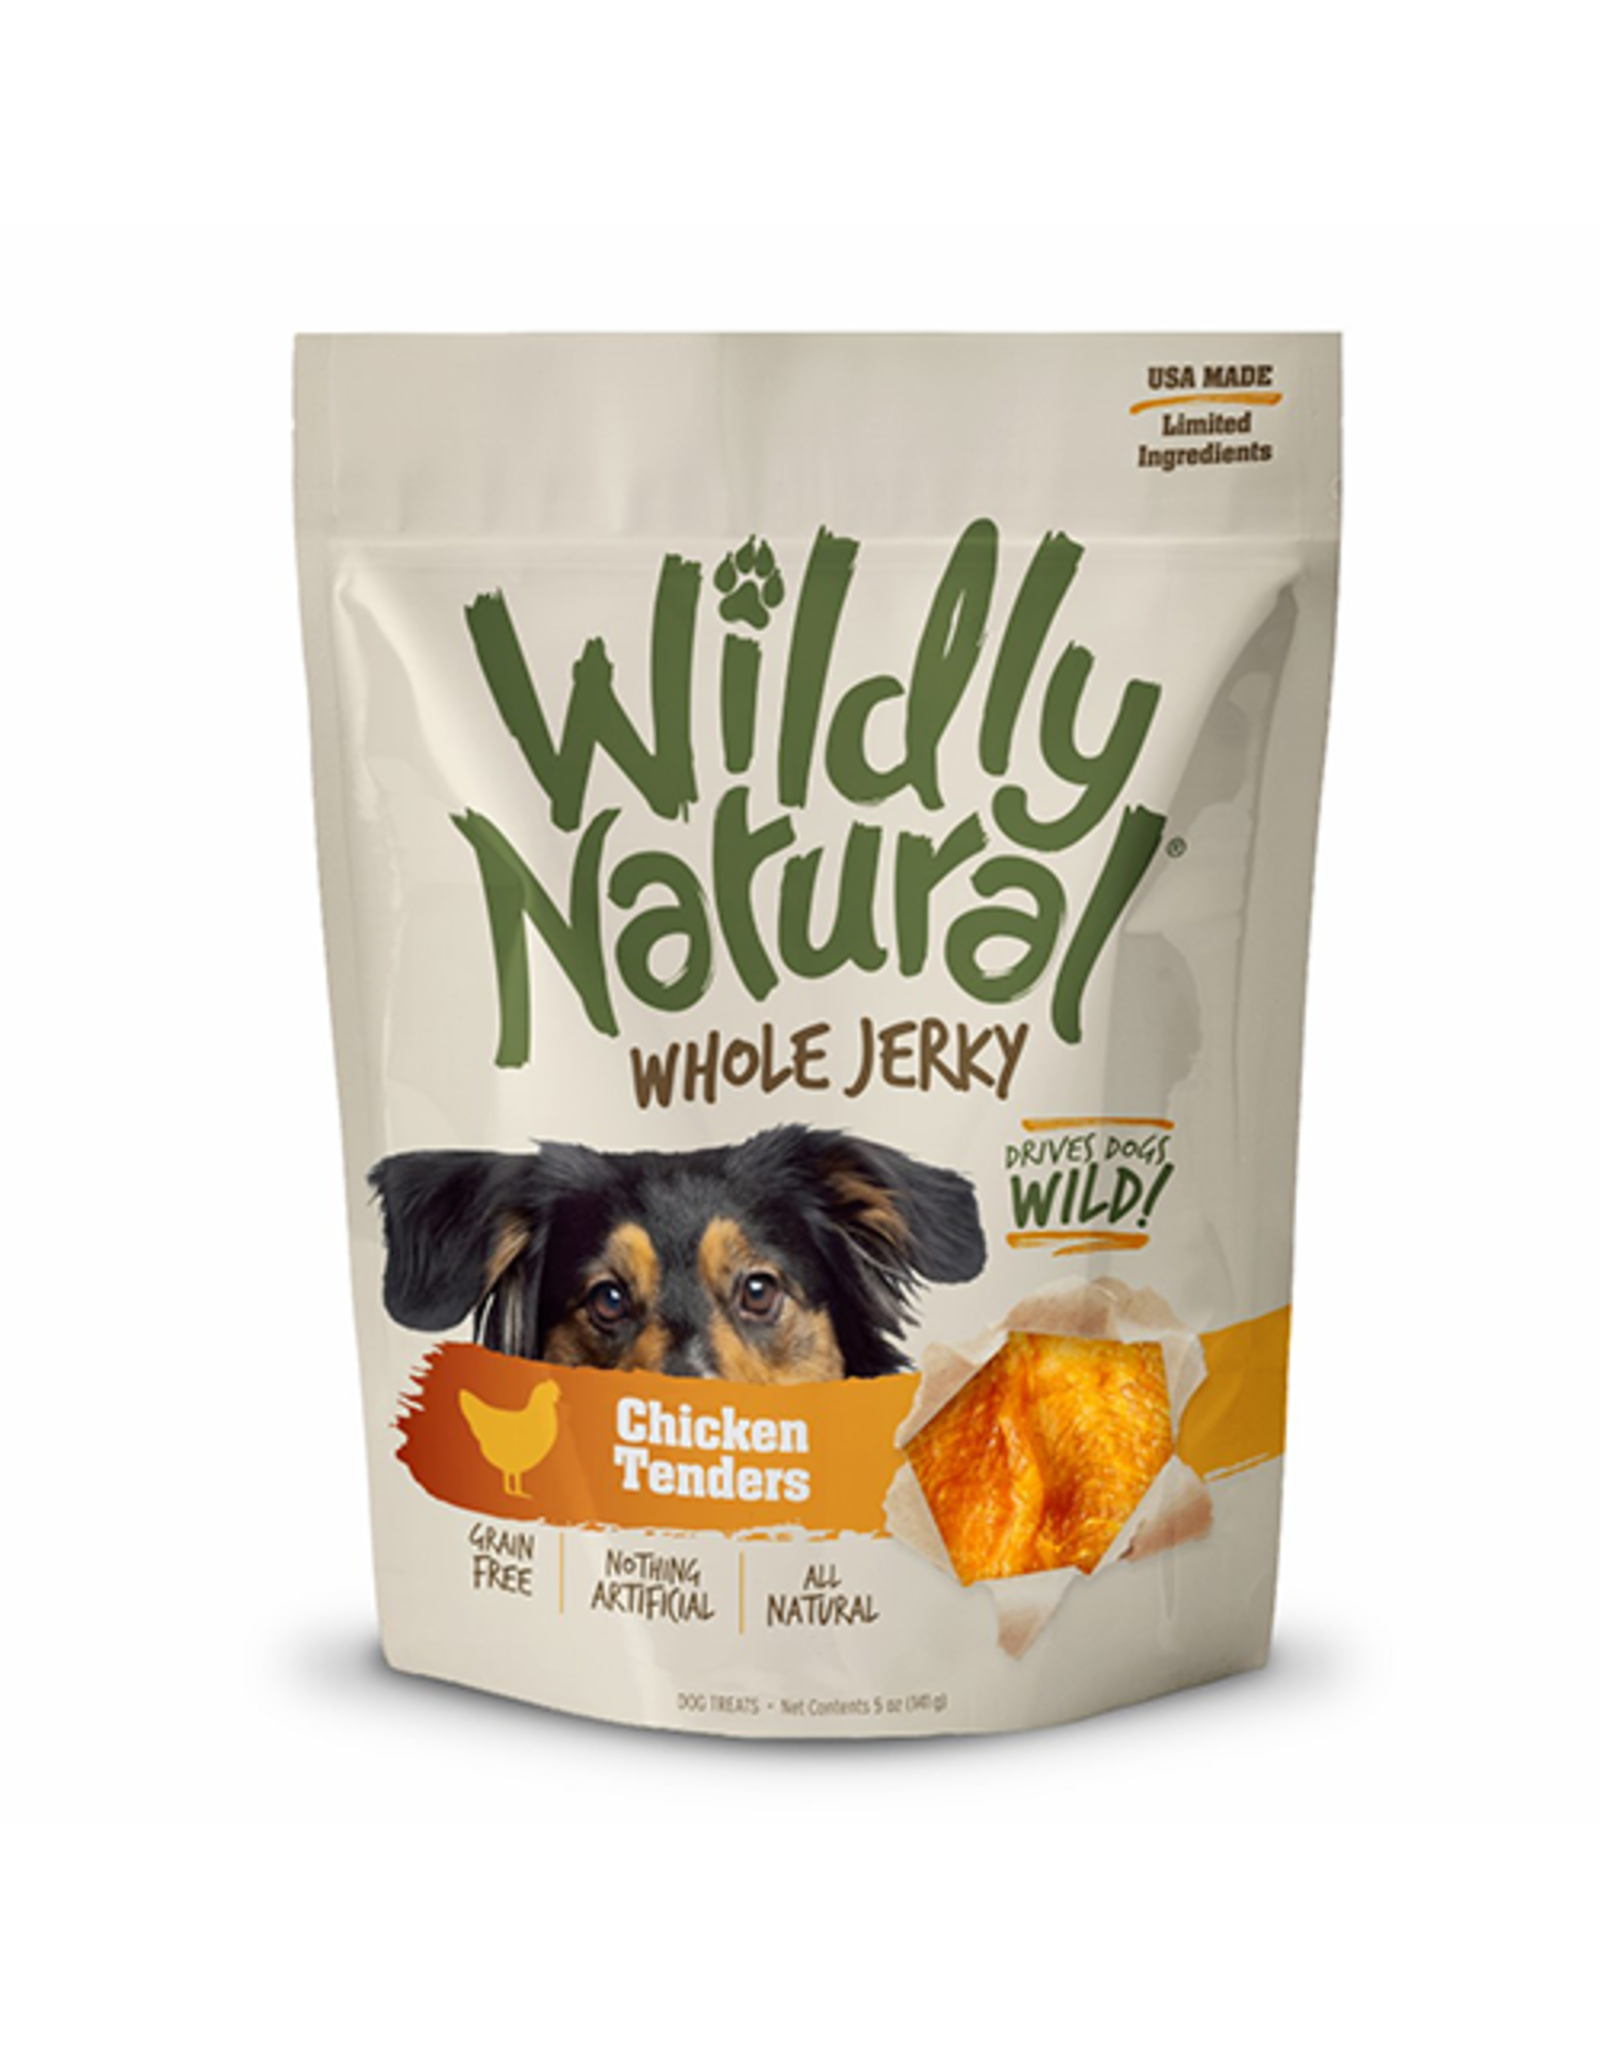 Fruitables Fruitables Wildly Natural Chicken Tenders 5oz